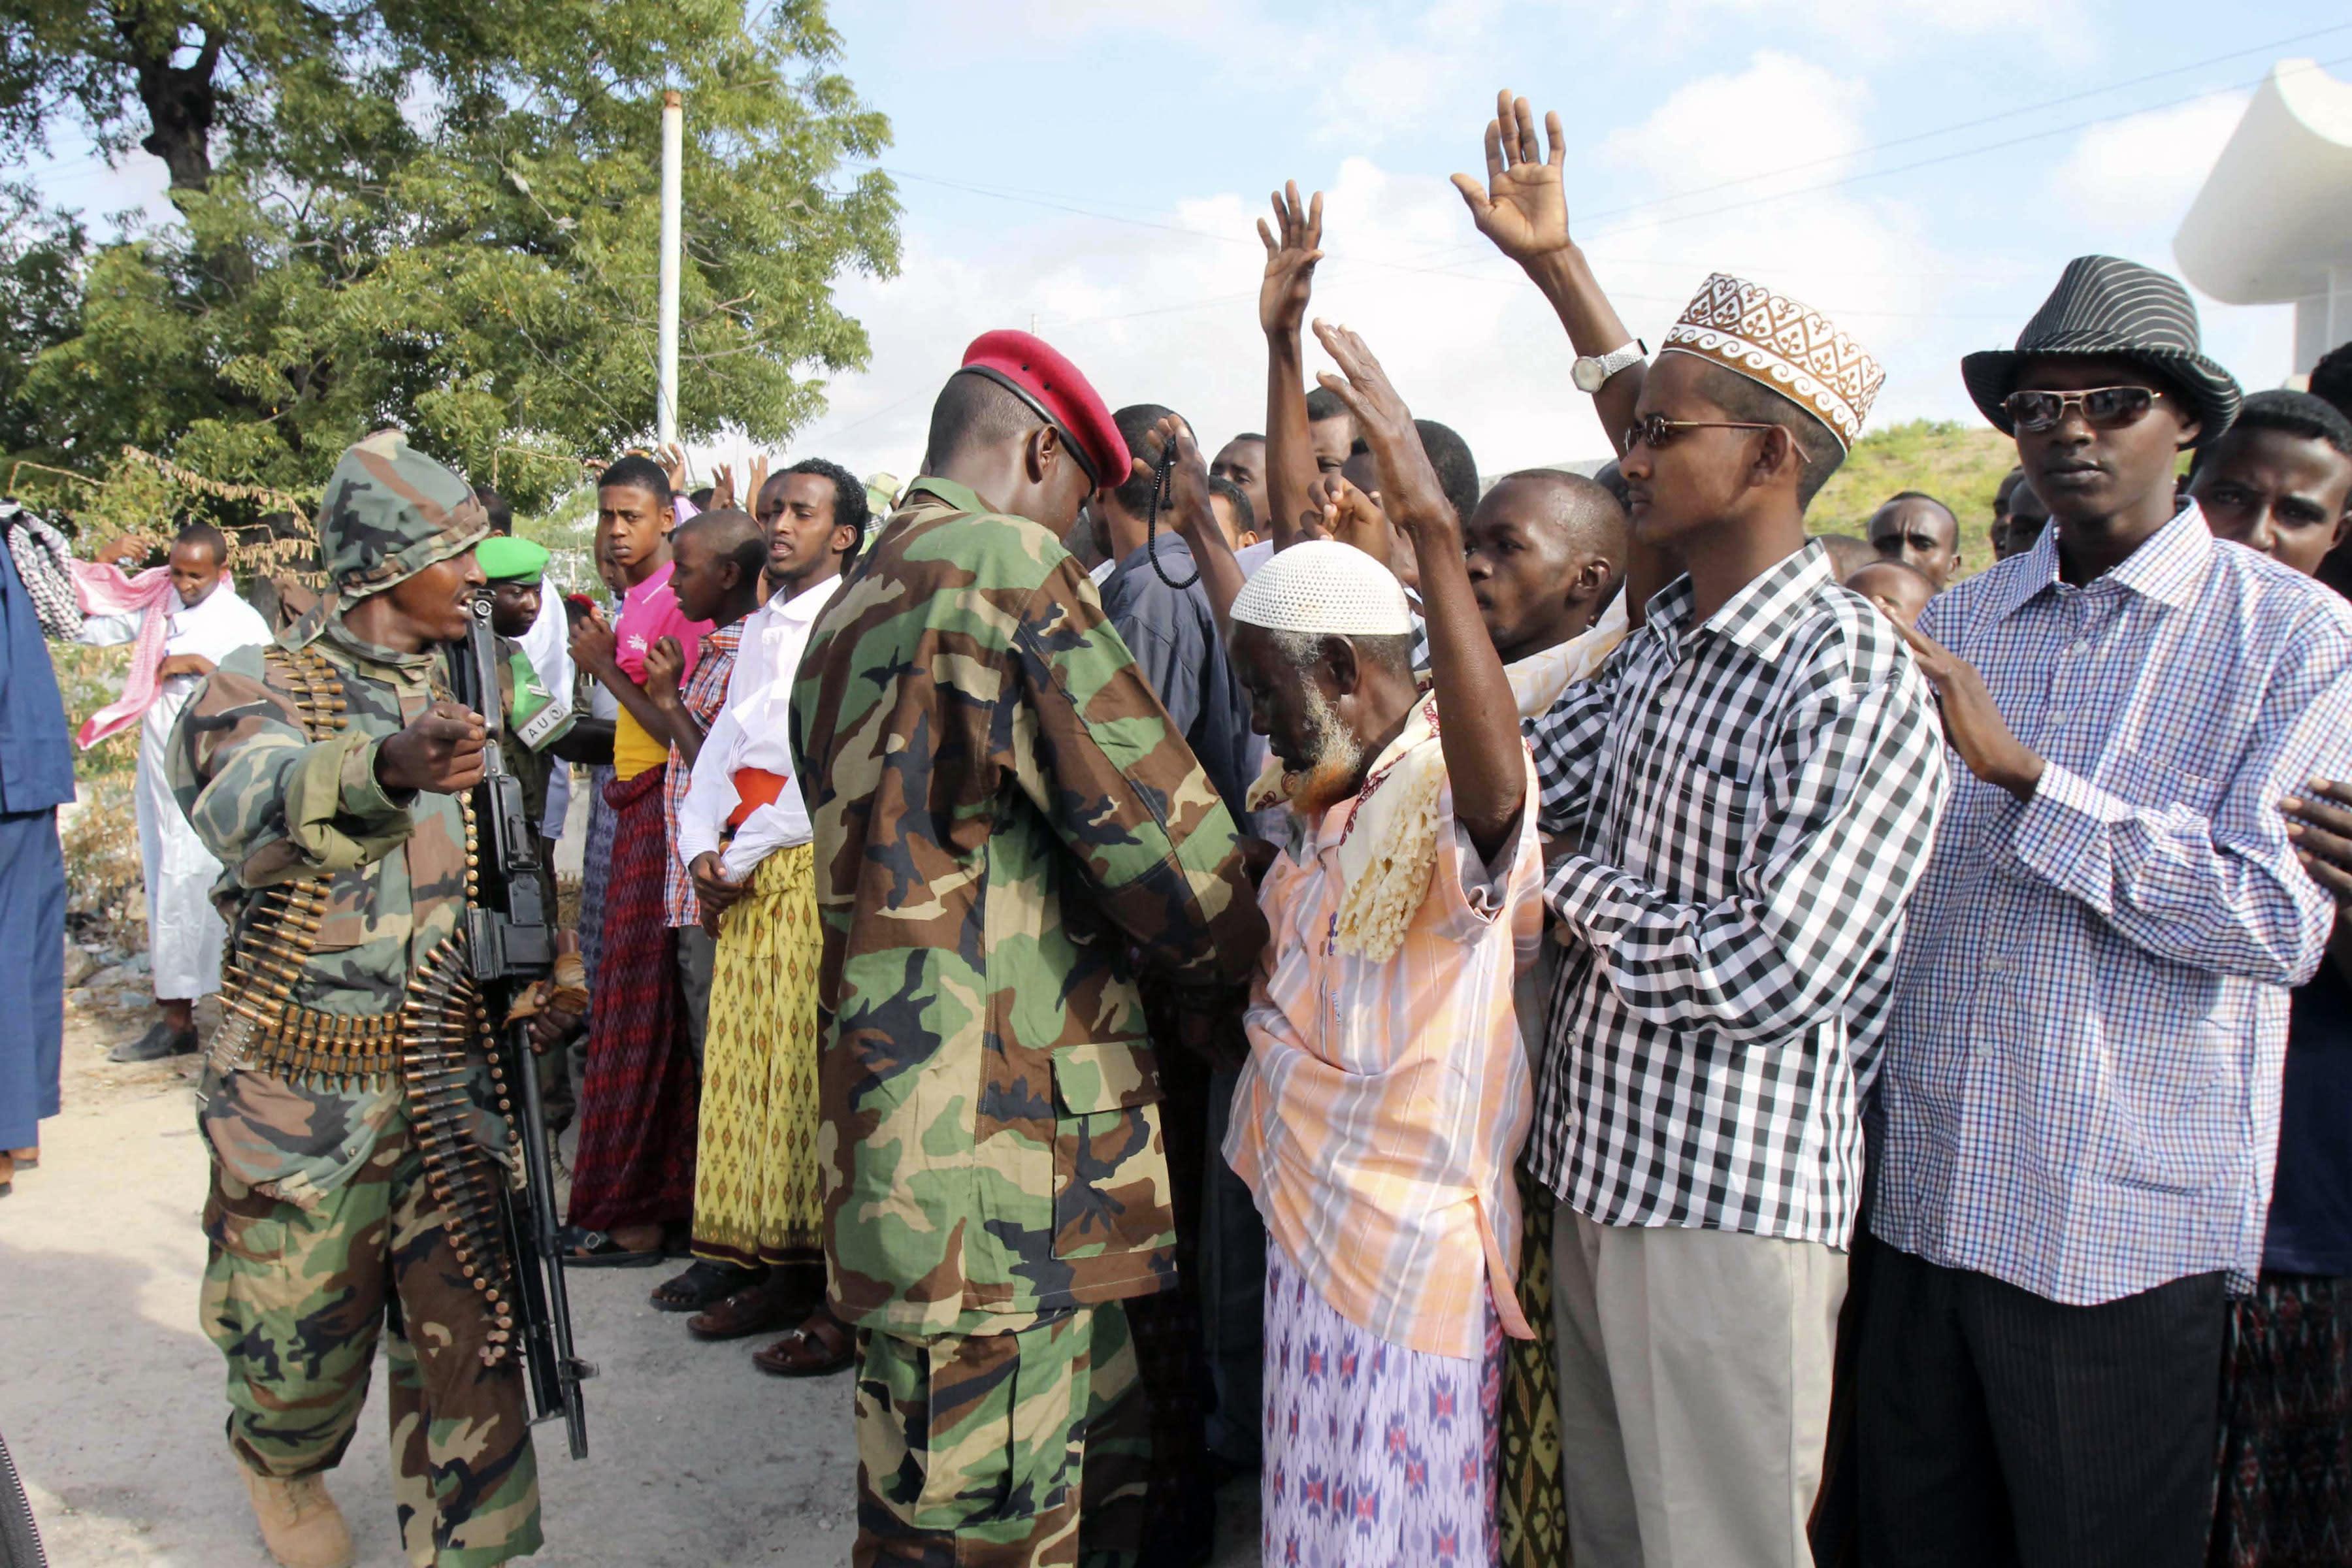 Somali government soldiers check people entering Isbahaysi Mosque in Mogadishu,Somalia during Eid al Fitr prayers Sunday Aug, 19, 2012. (AP Photo/Farah Abdi Warsameh)